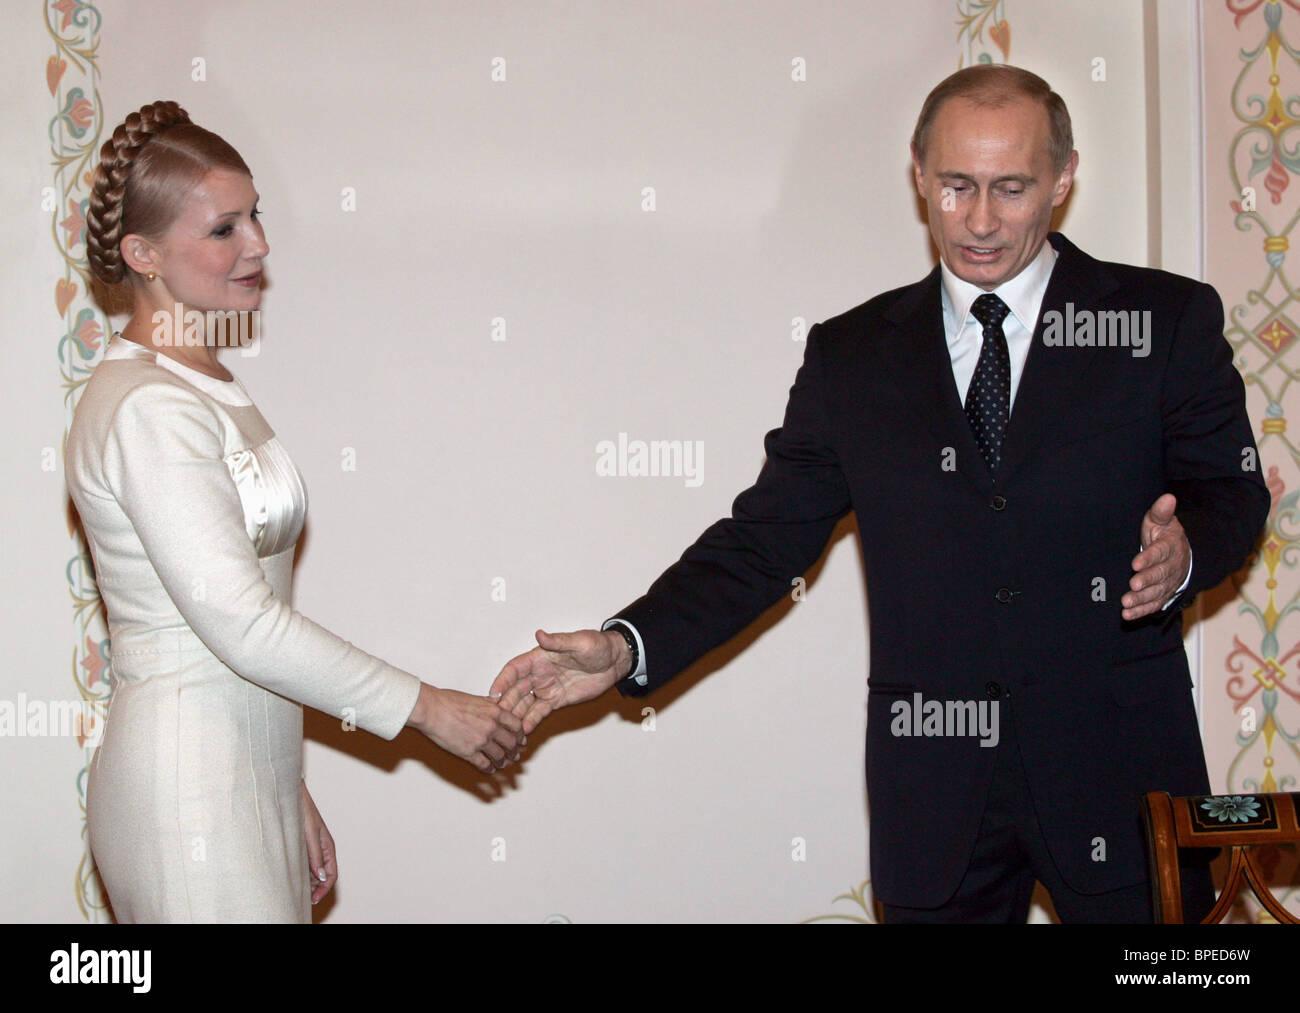 Russia's President Vladimir Putin meets with Prime Minister of Ukraine Yulia Timoshenko - Stock Image